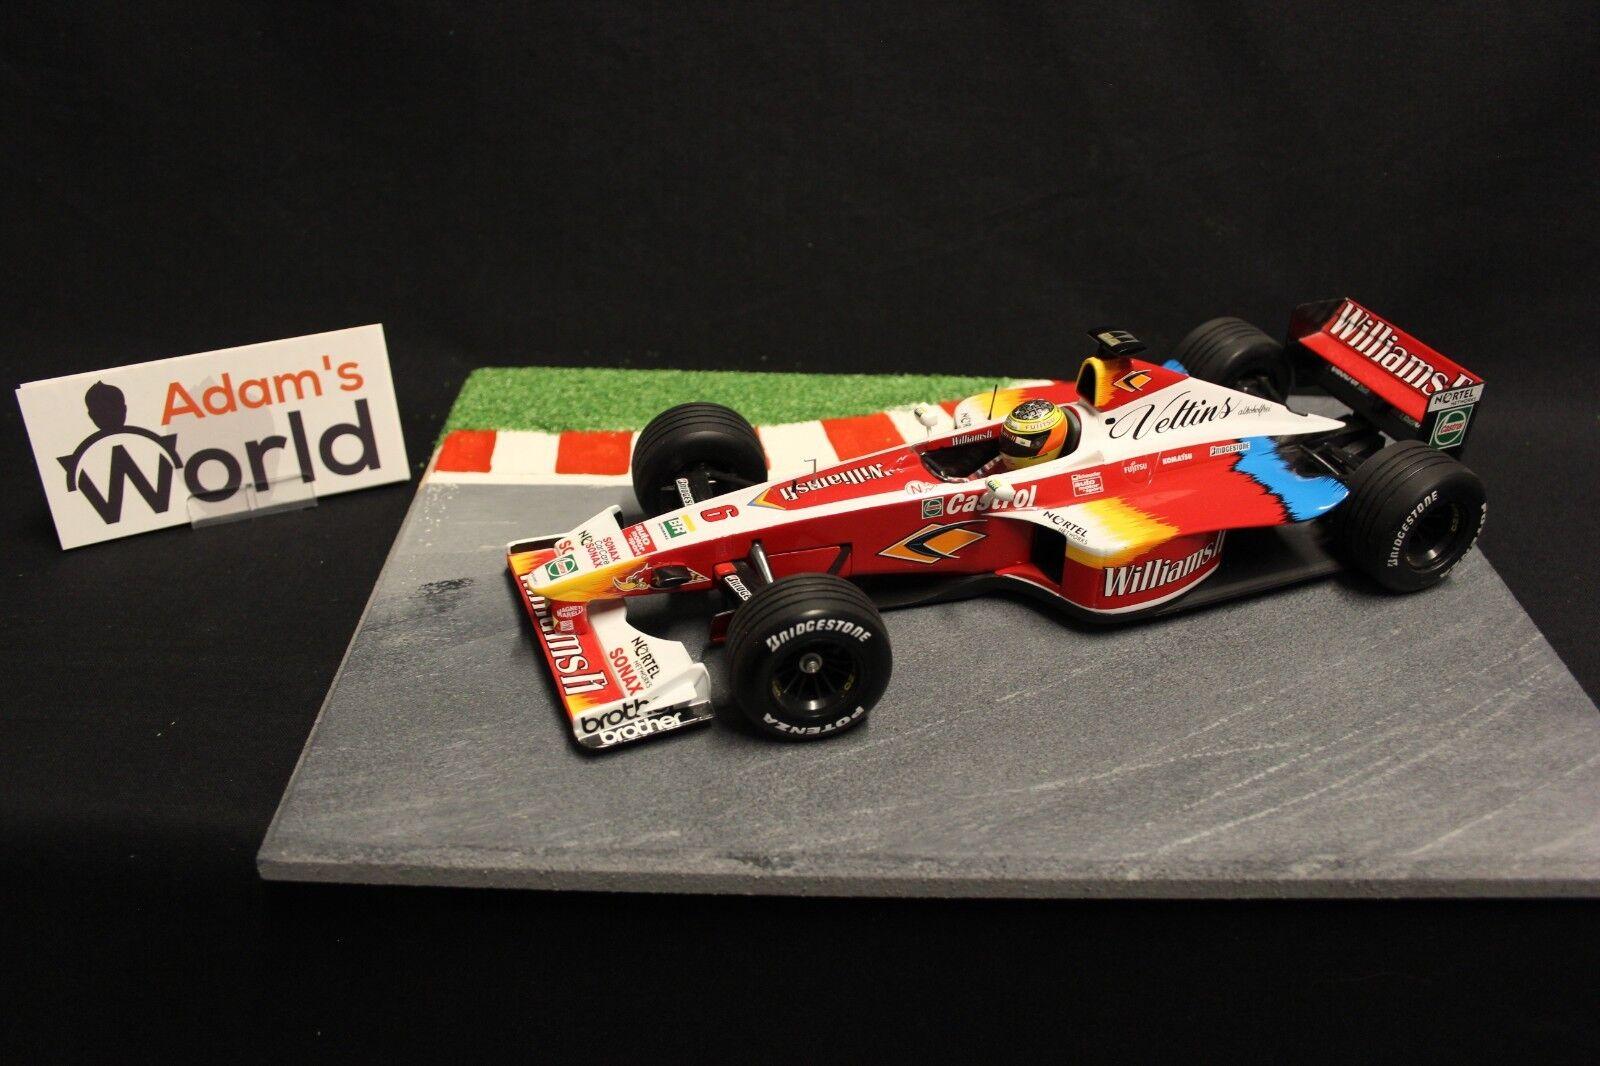 Hot Wheels Williams Supertec FW21 1999 1 18 Ralf Schumacher (GER) (F1NB)